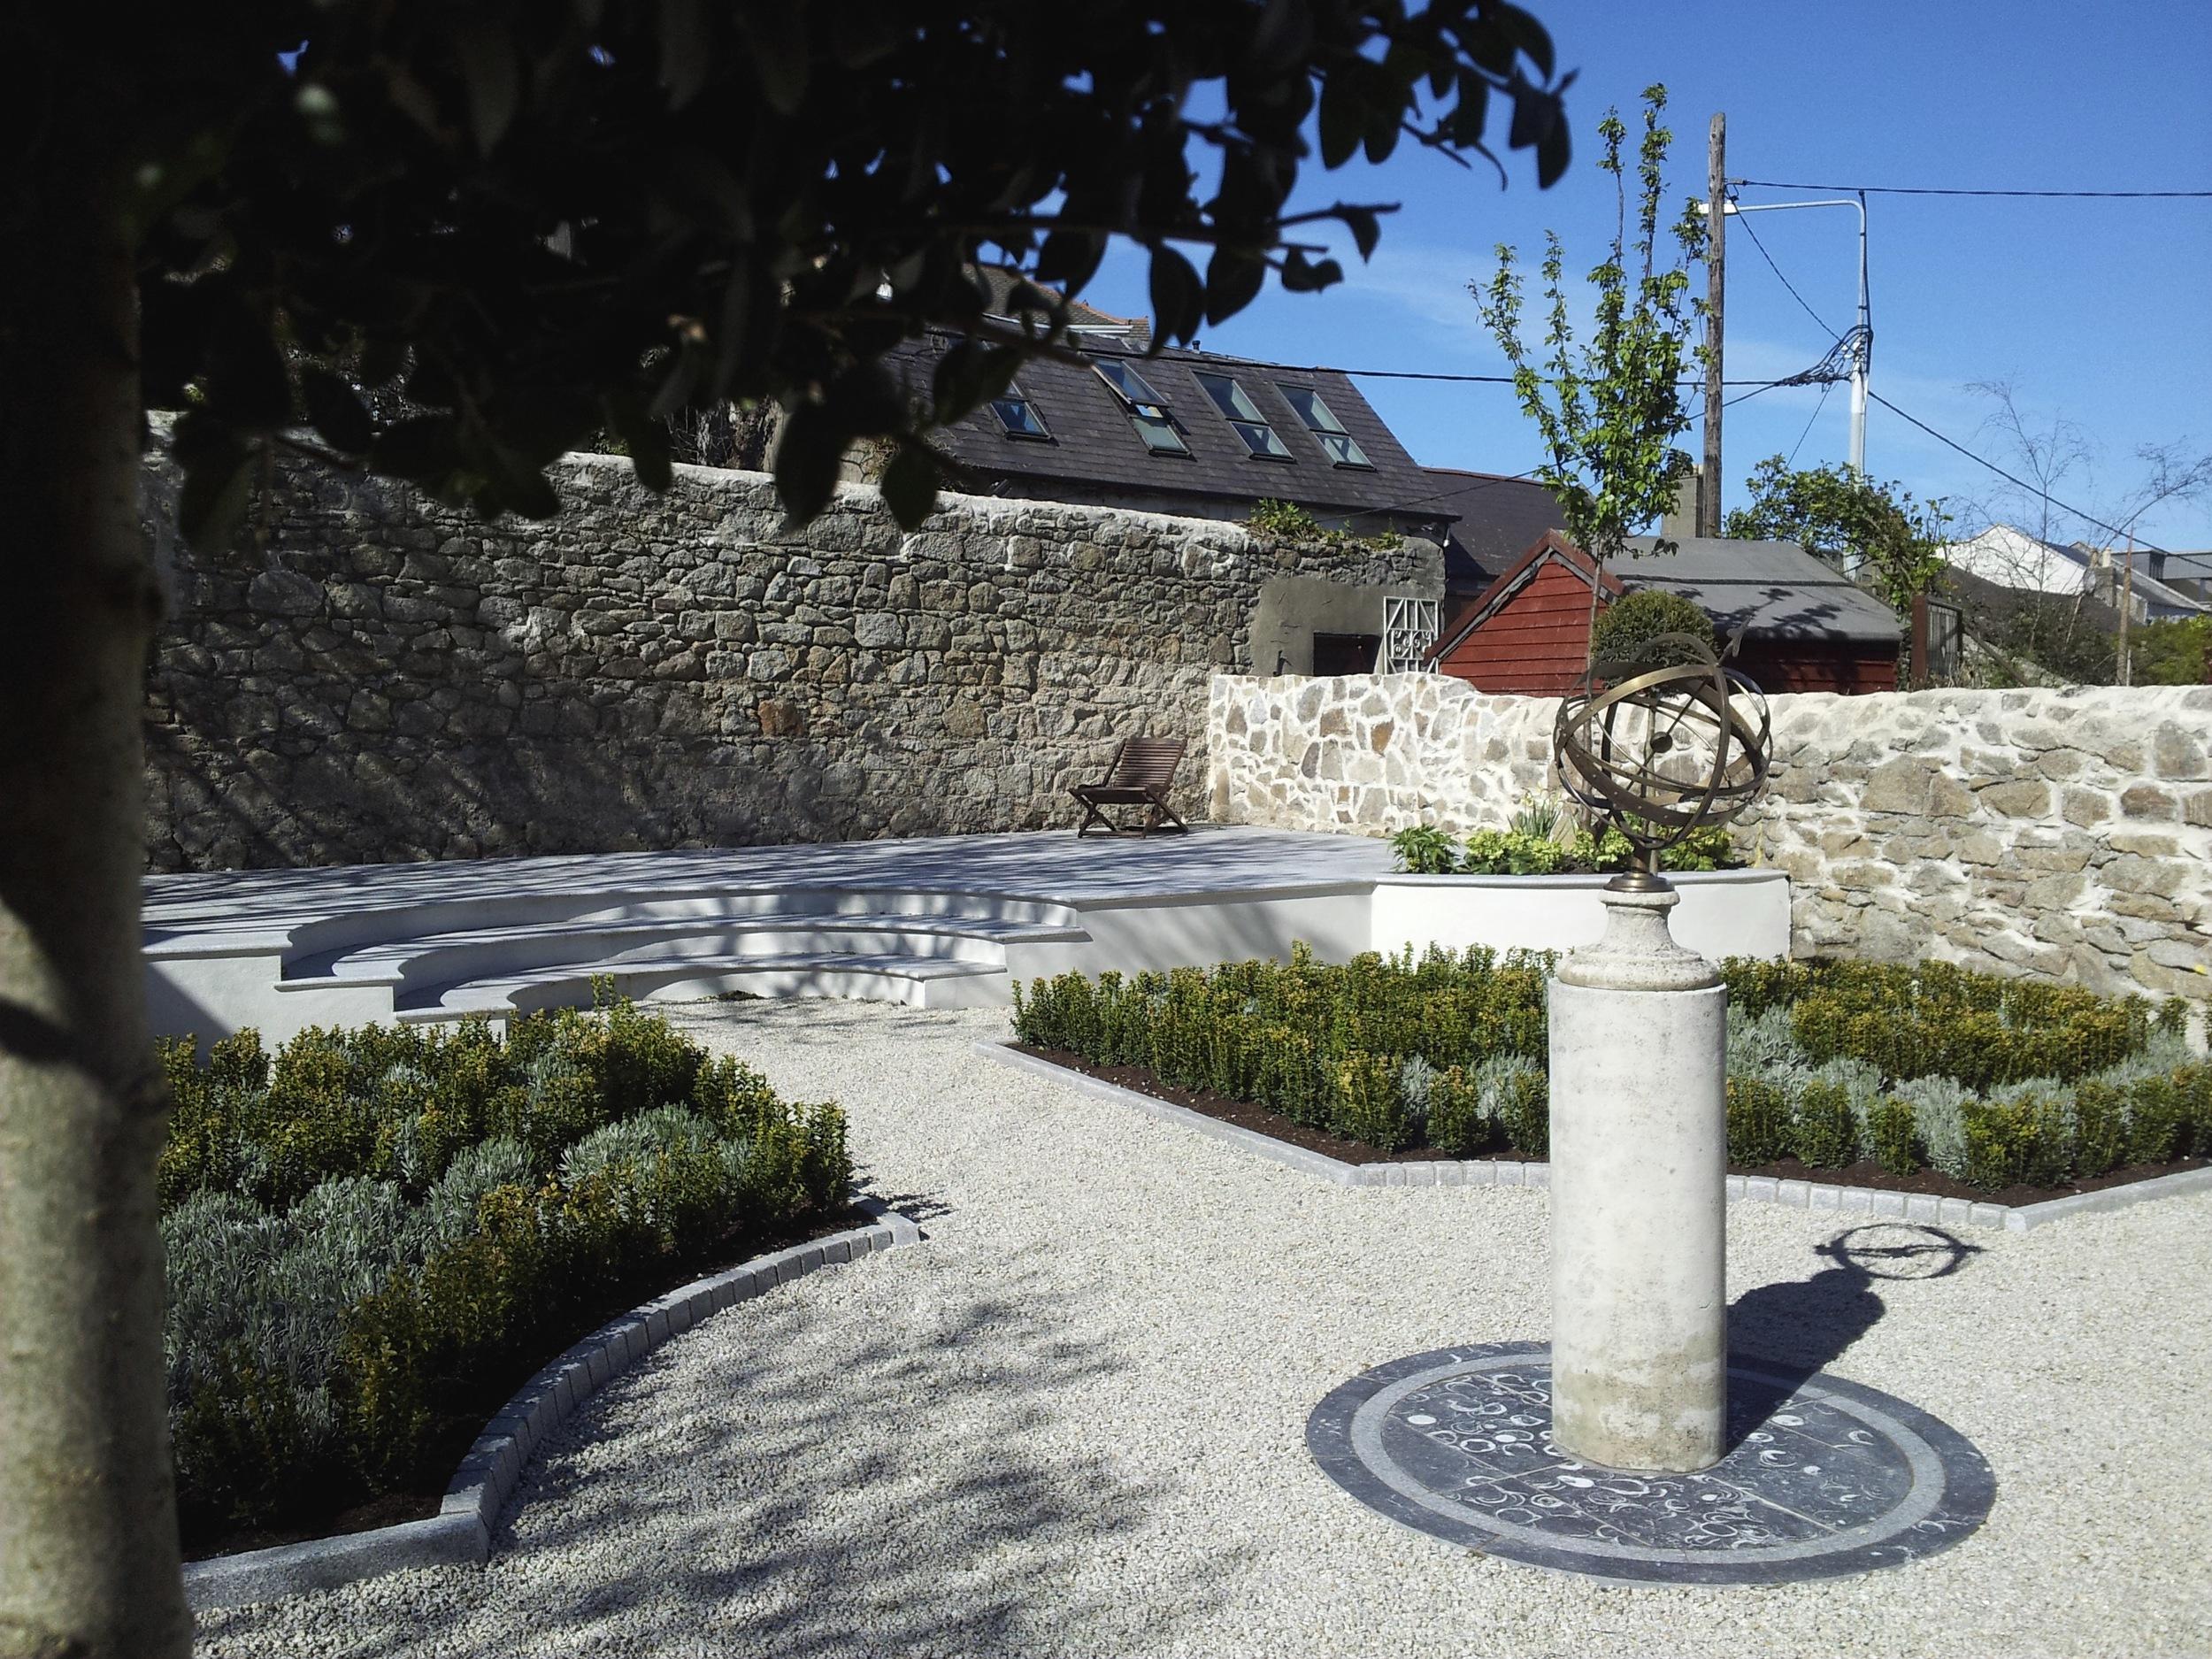 Central sculpture of Garden